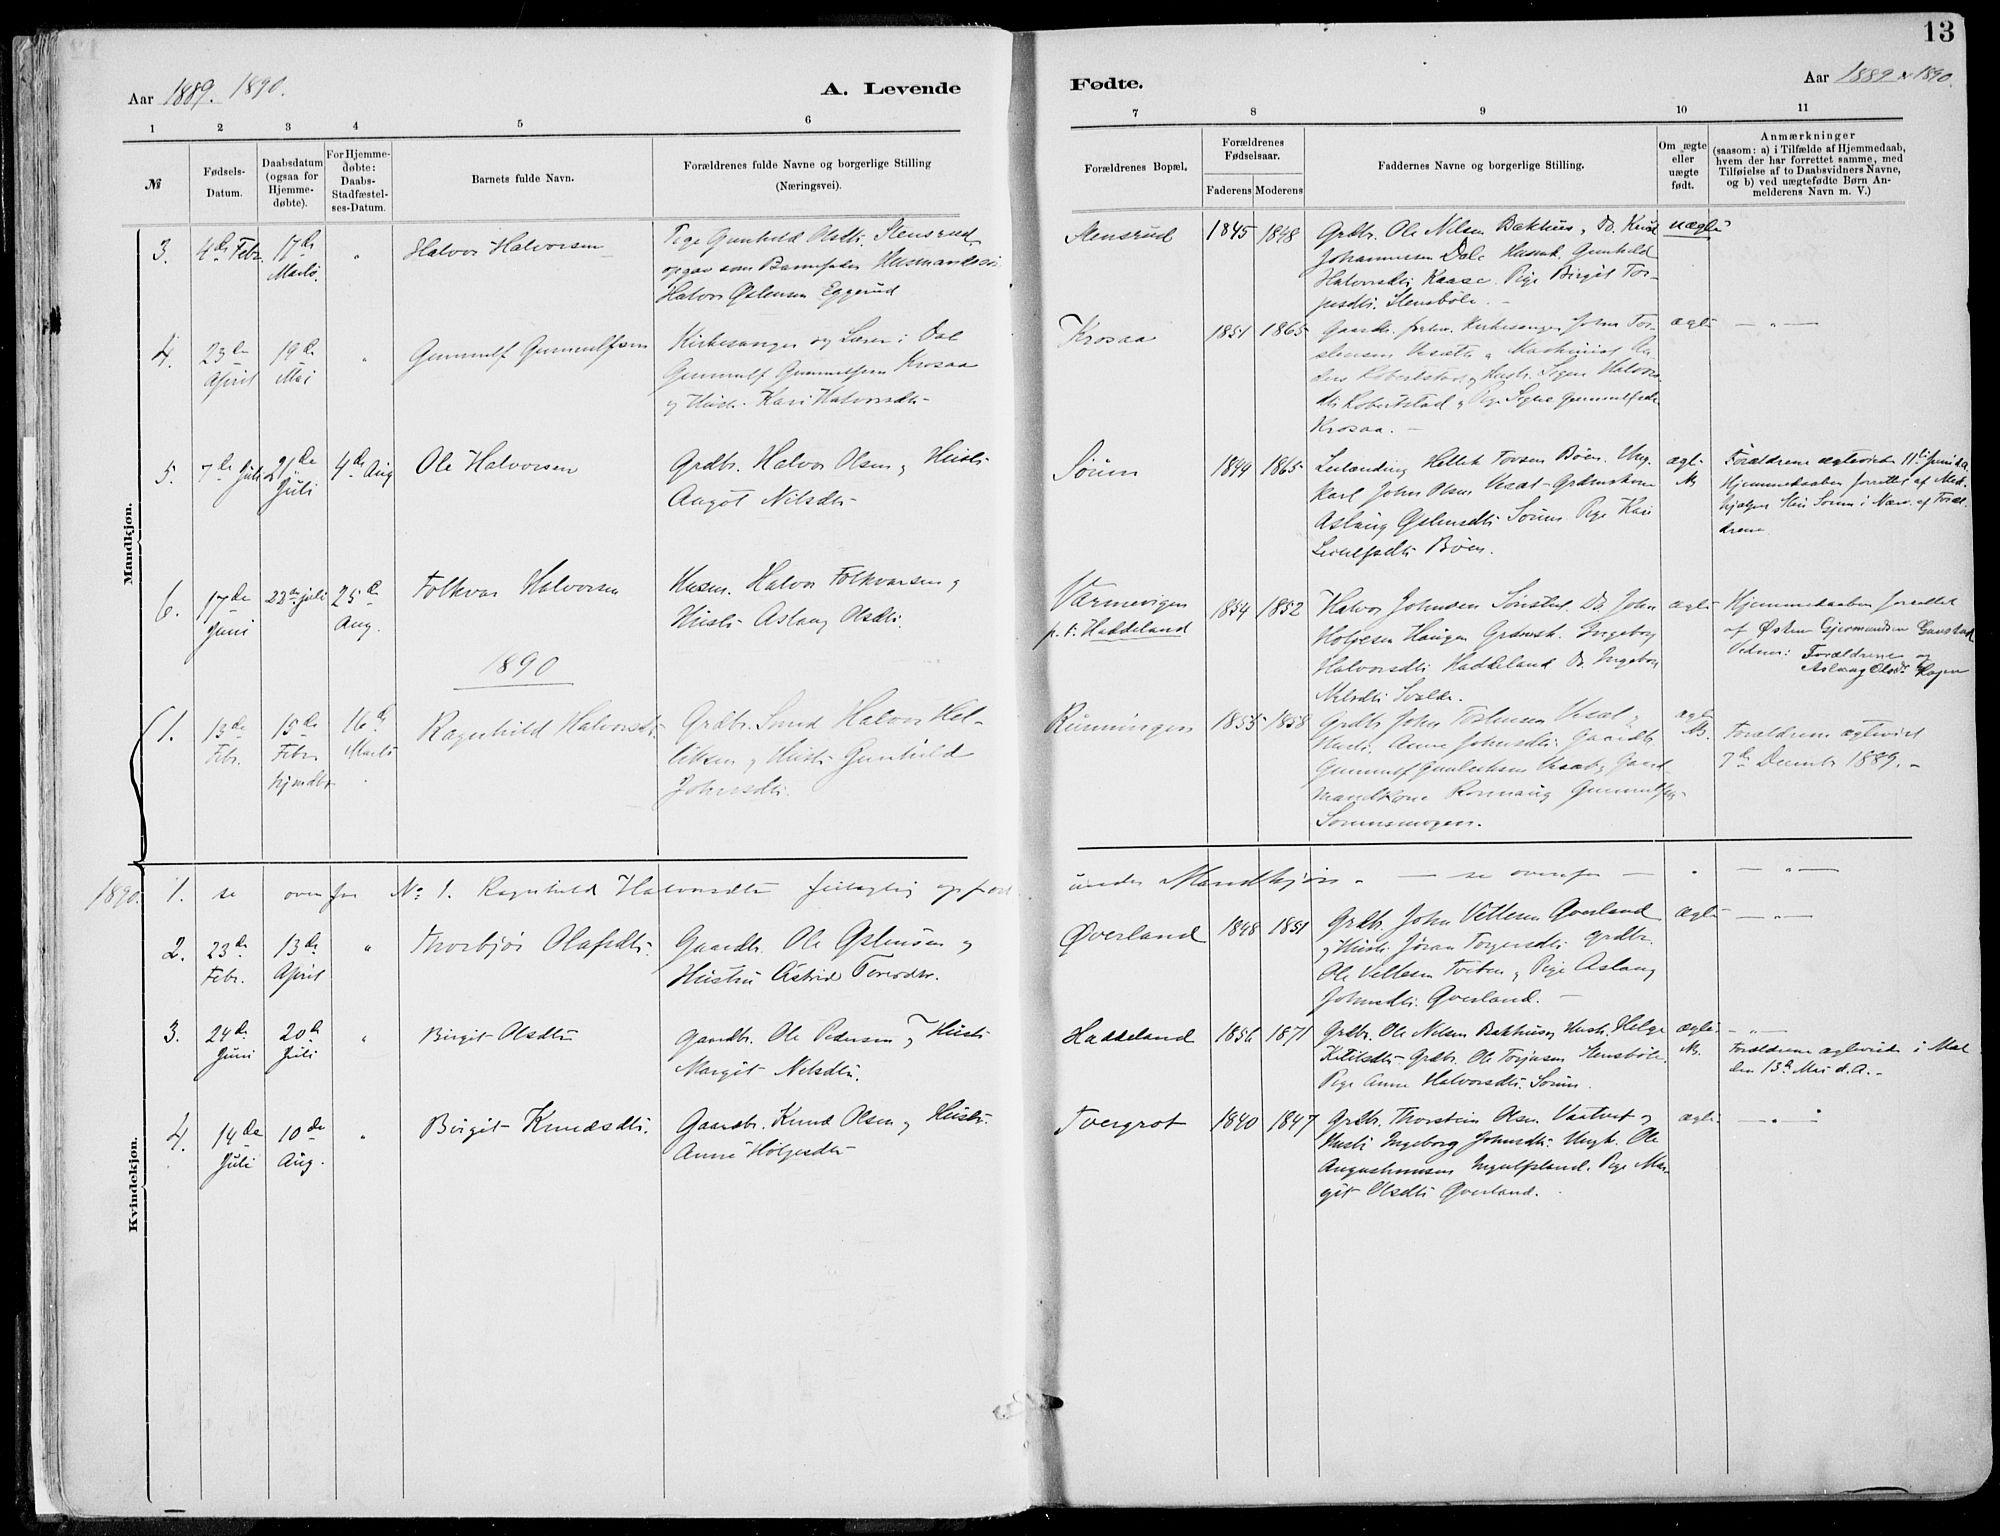 SAKO, Rjukan kirkebøker, F/Fa/L0001: Ministerialbok nr. 1, 1878-1912, s. 13